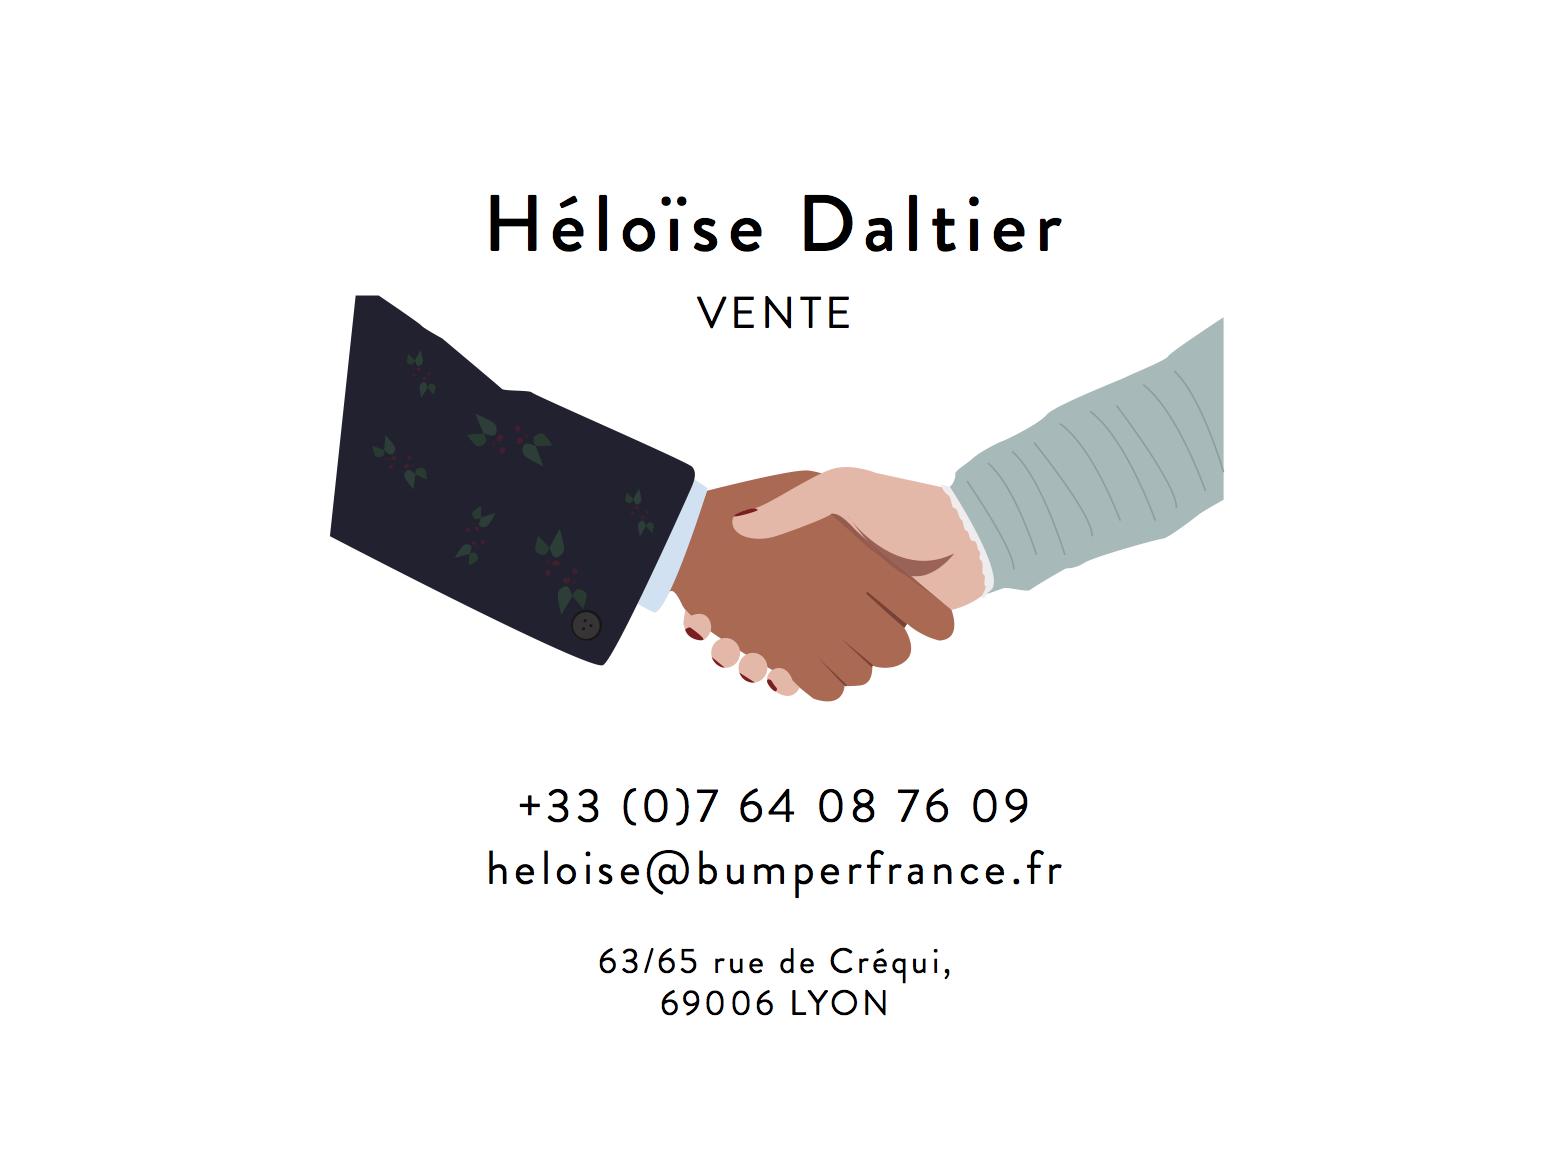 HELOISE-bumper-immobilier-achat-vente-investissment-appartement-location-homestaging-decoration-stylisme-interieur